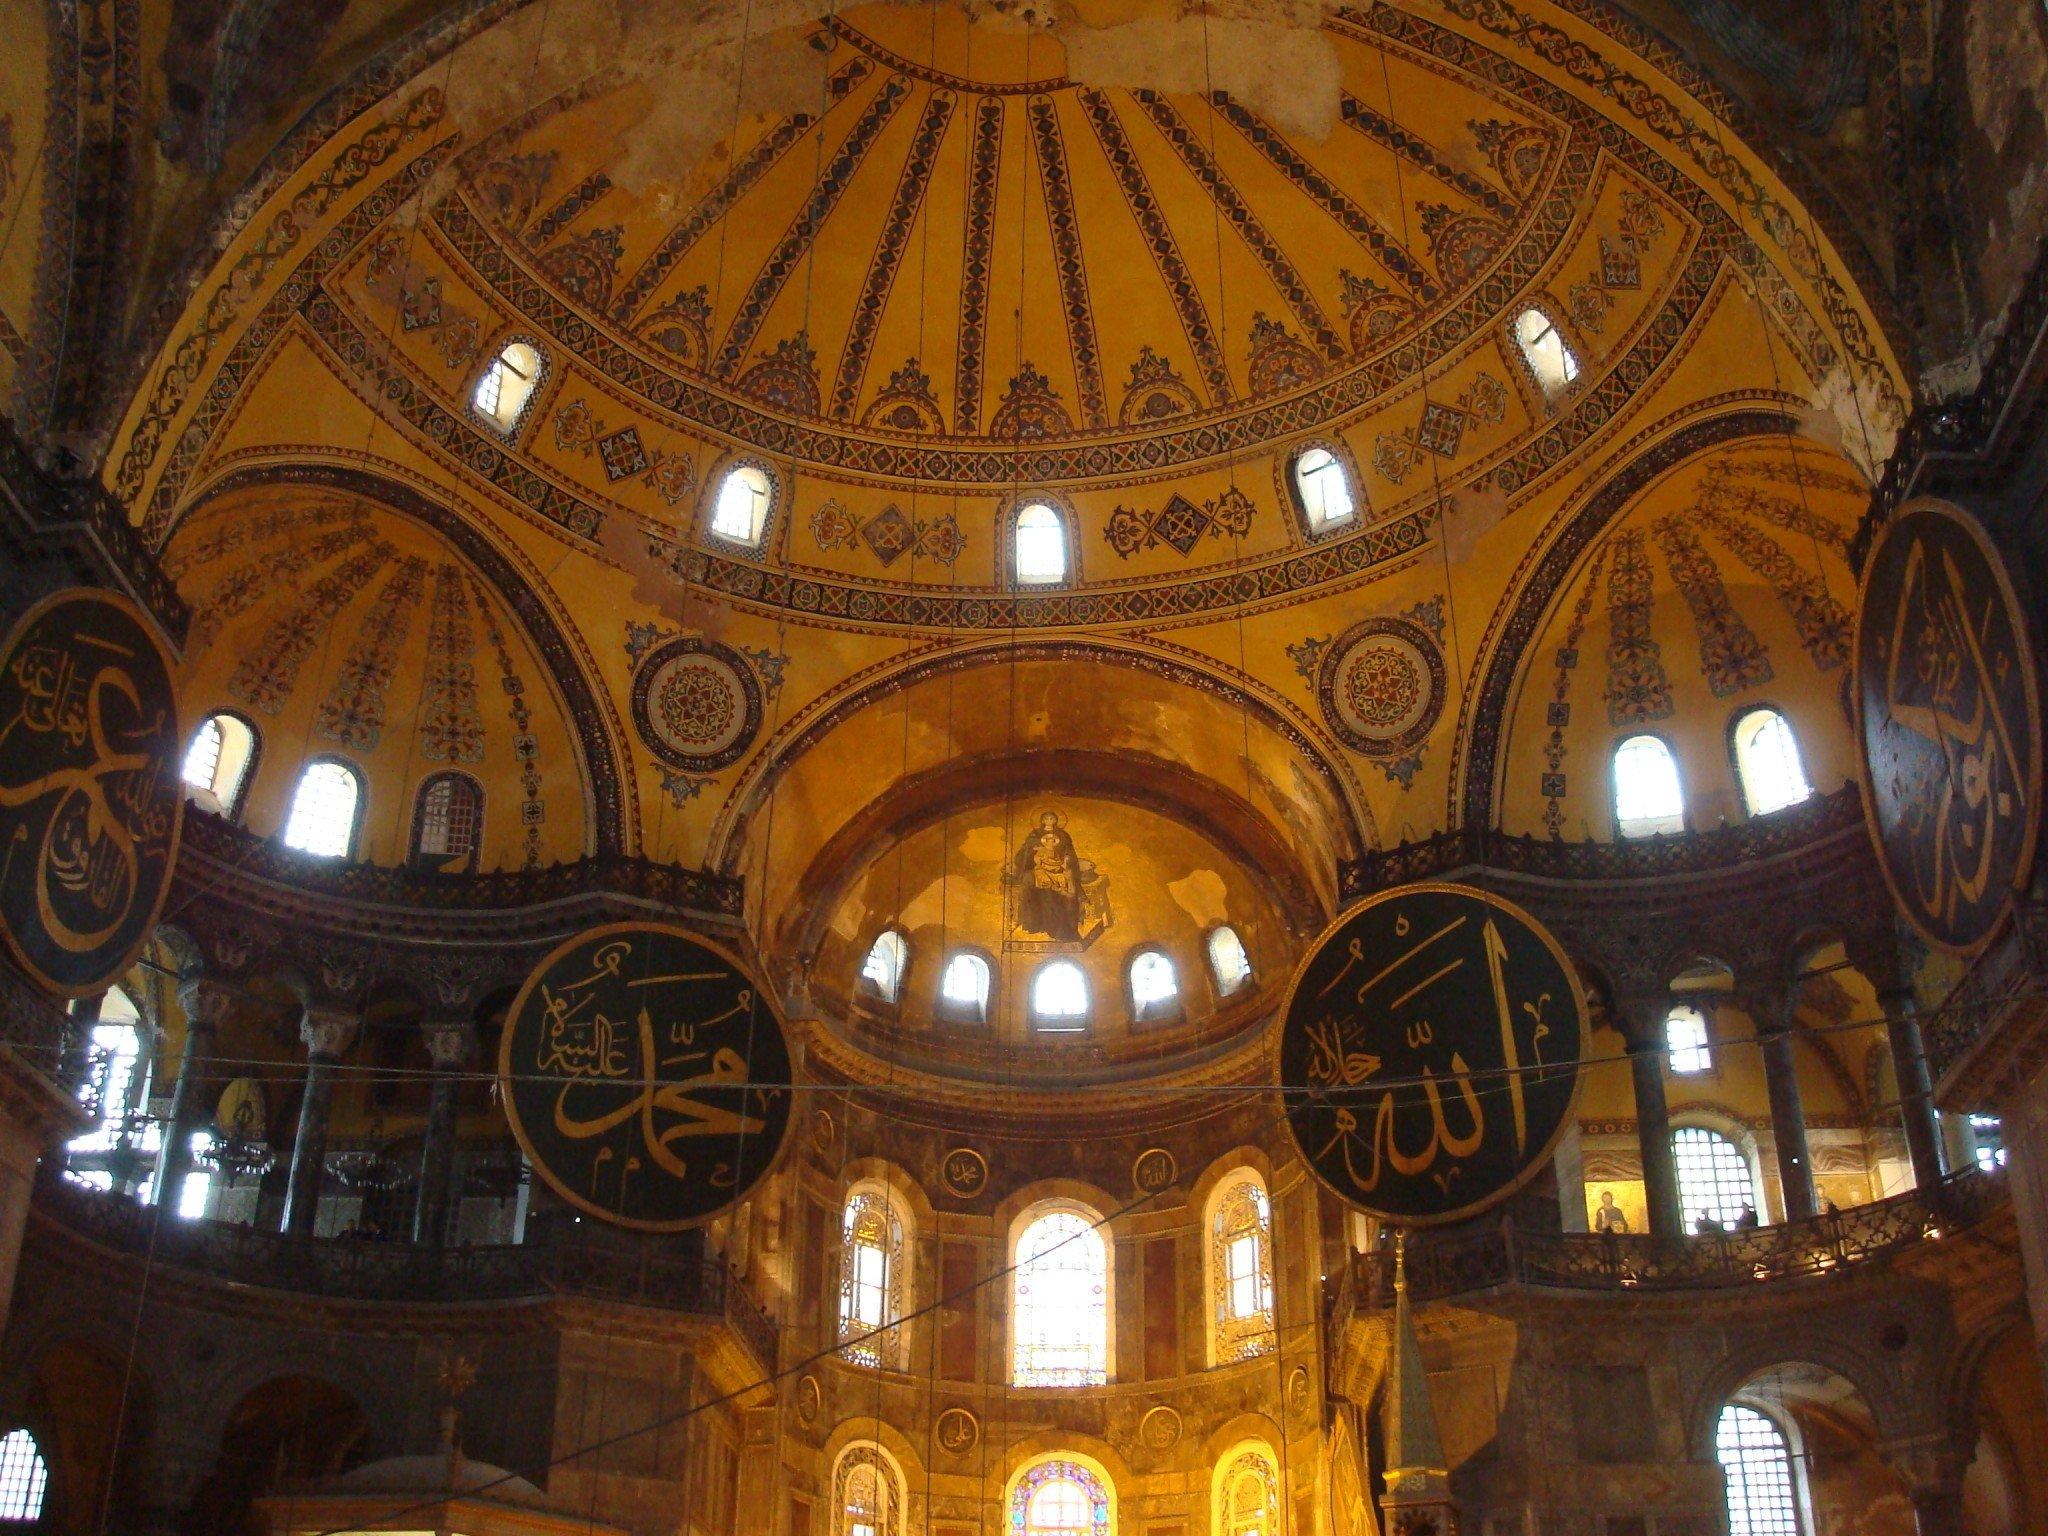 Moschee Hagia Sophia in Istanbul